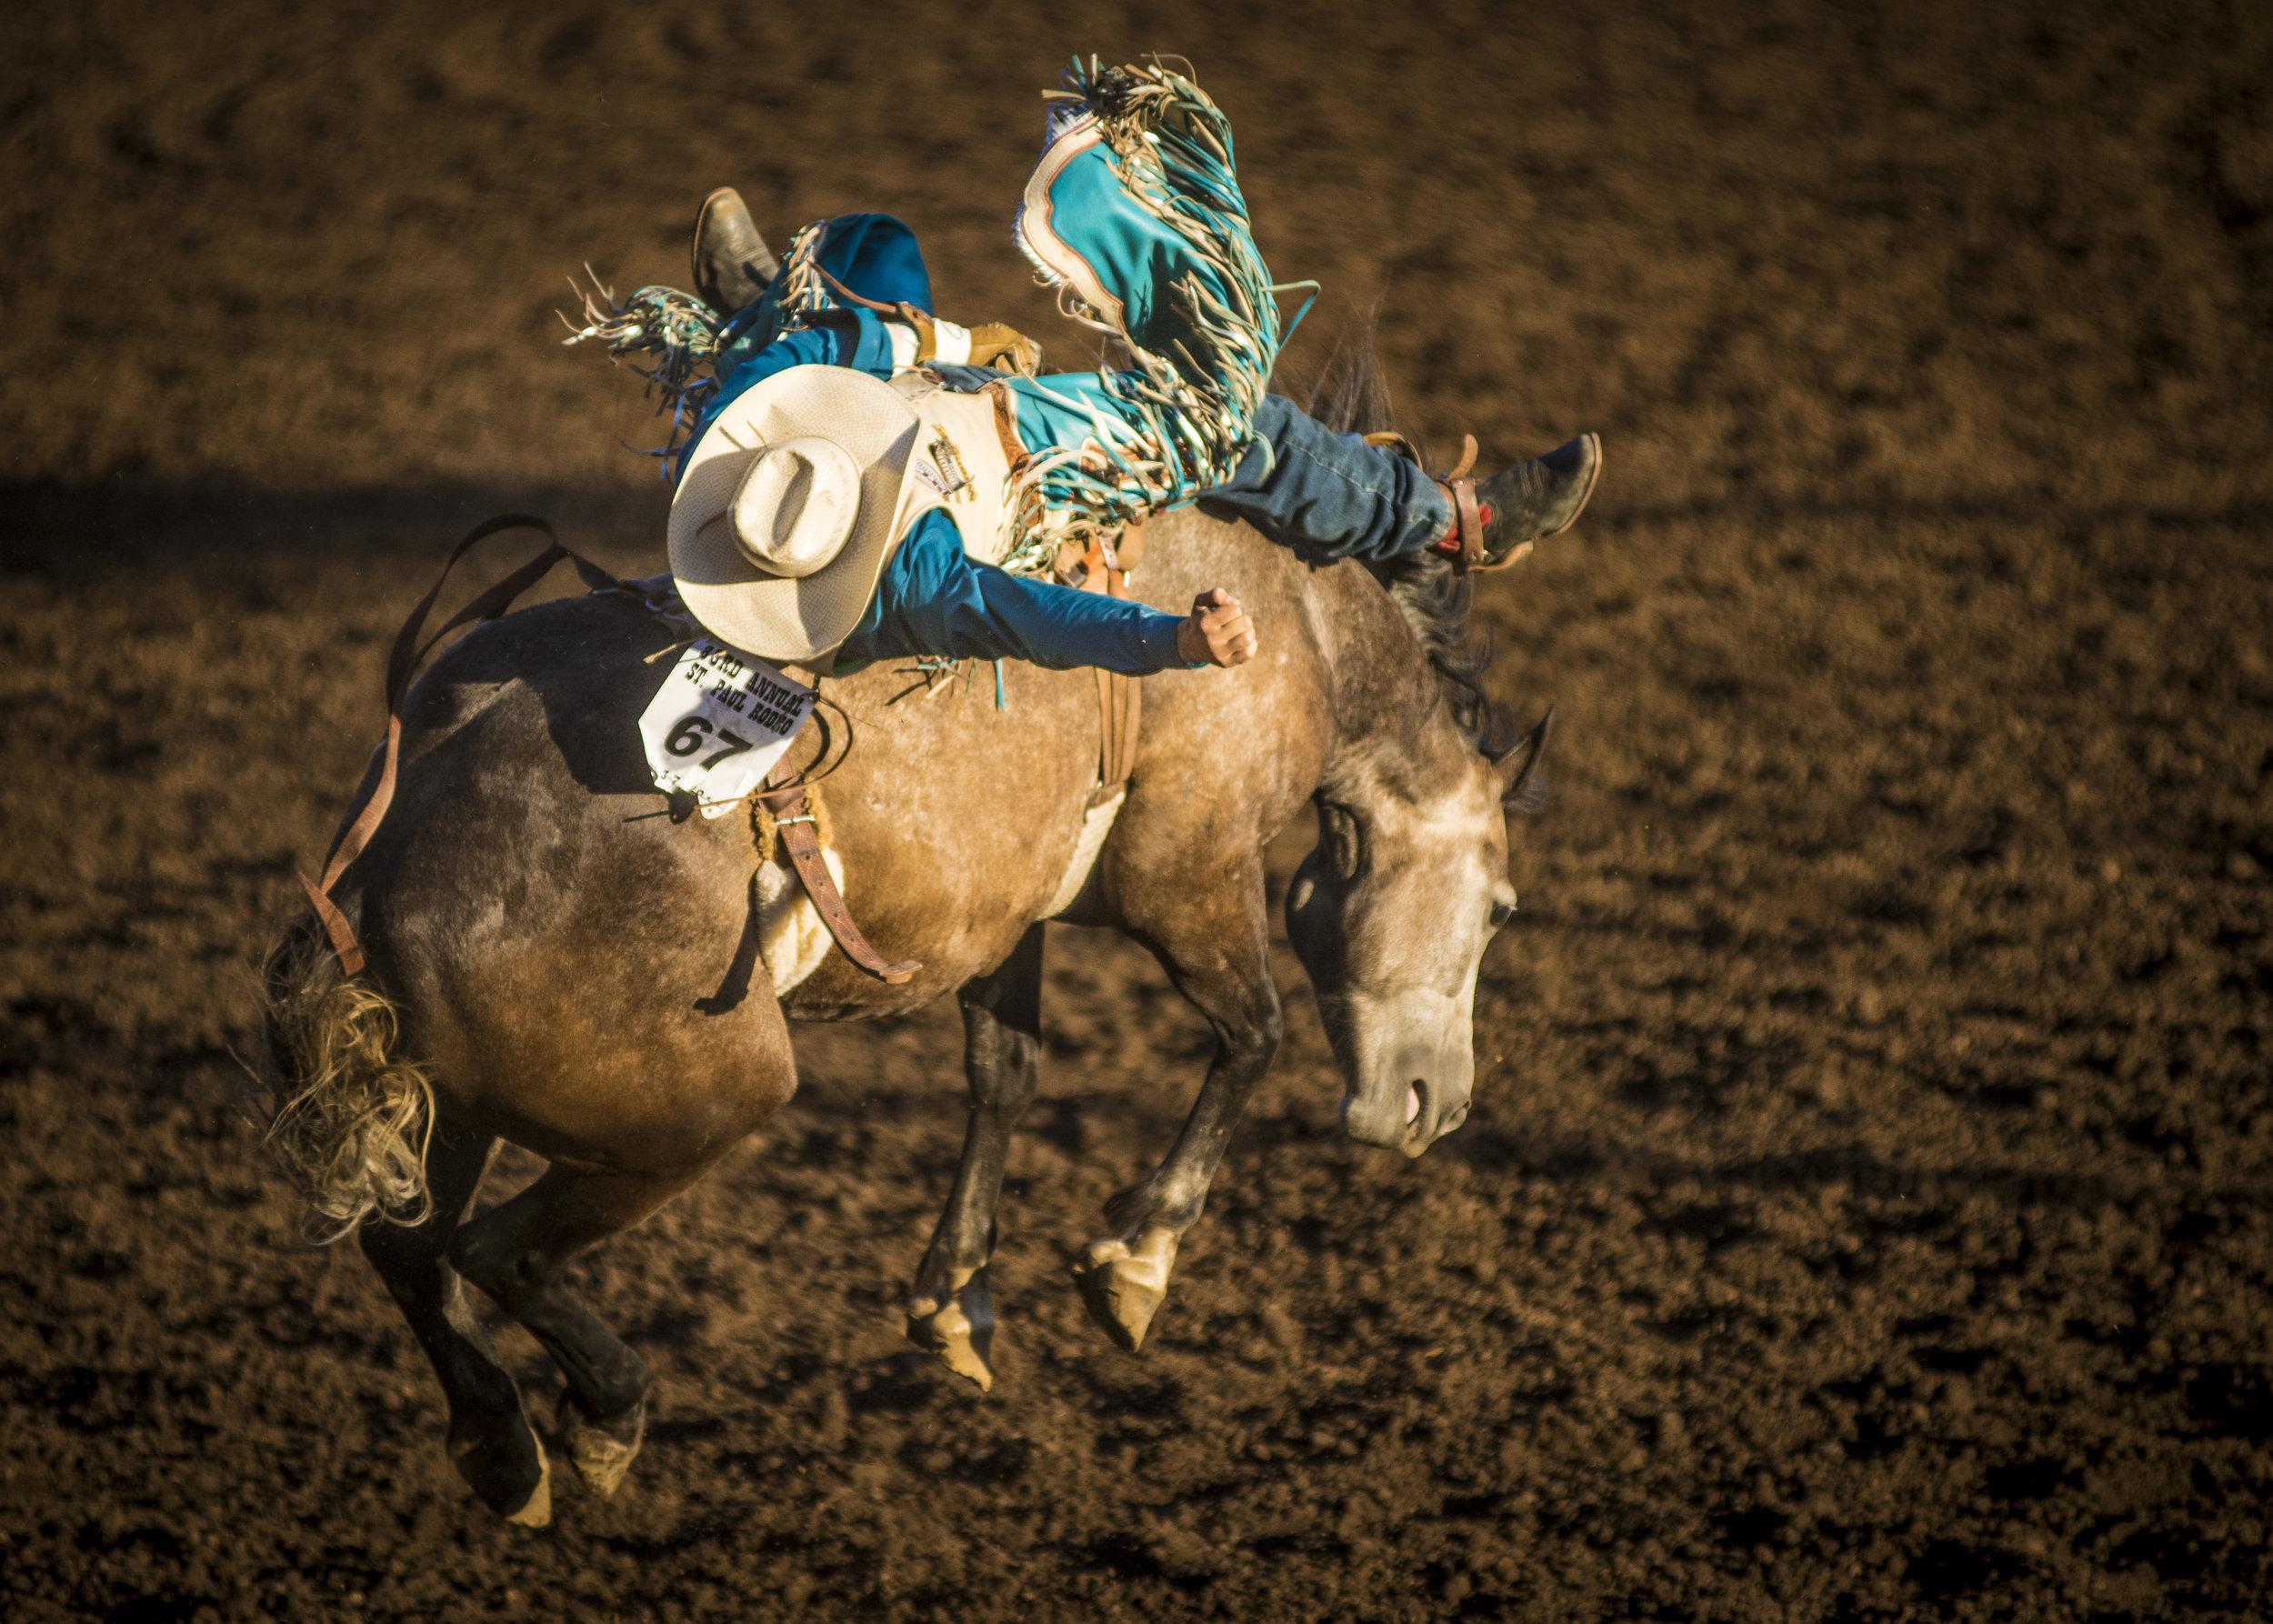 St Paul Rodeo - Bronco Rider 1